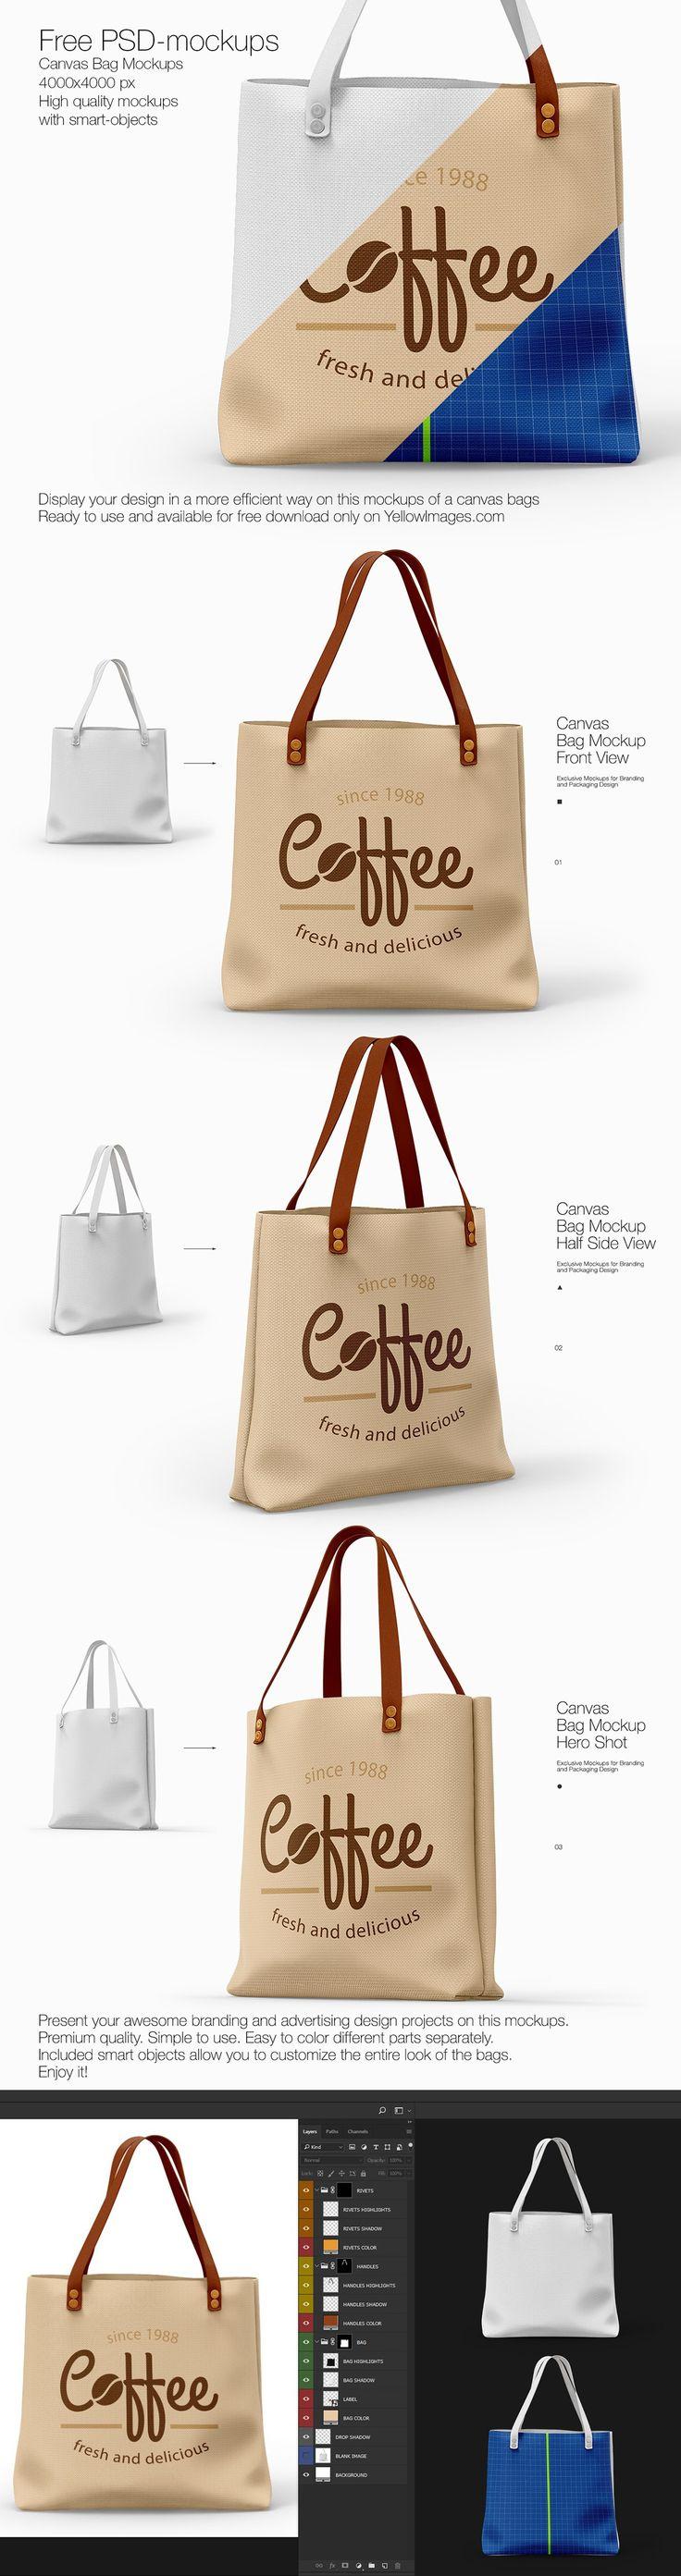 Free Canvas Bags PSD Mockup by Sergey Bandura